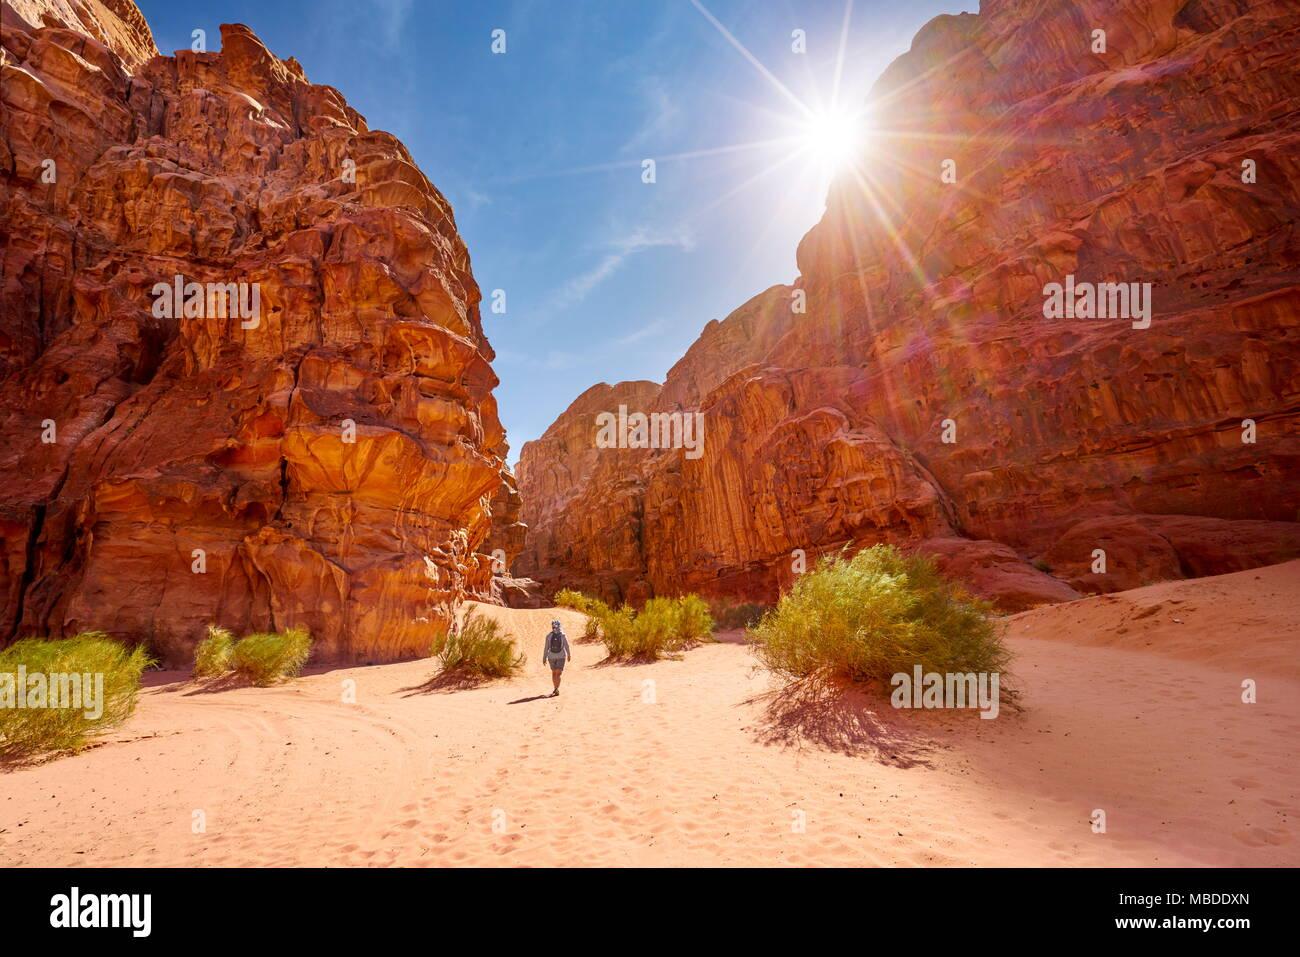 Trekking im Wadi Rum Wüste, Jordanien Stockbild